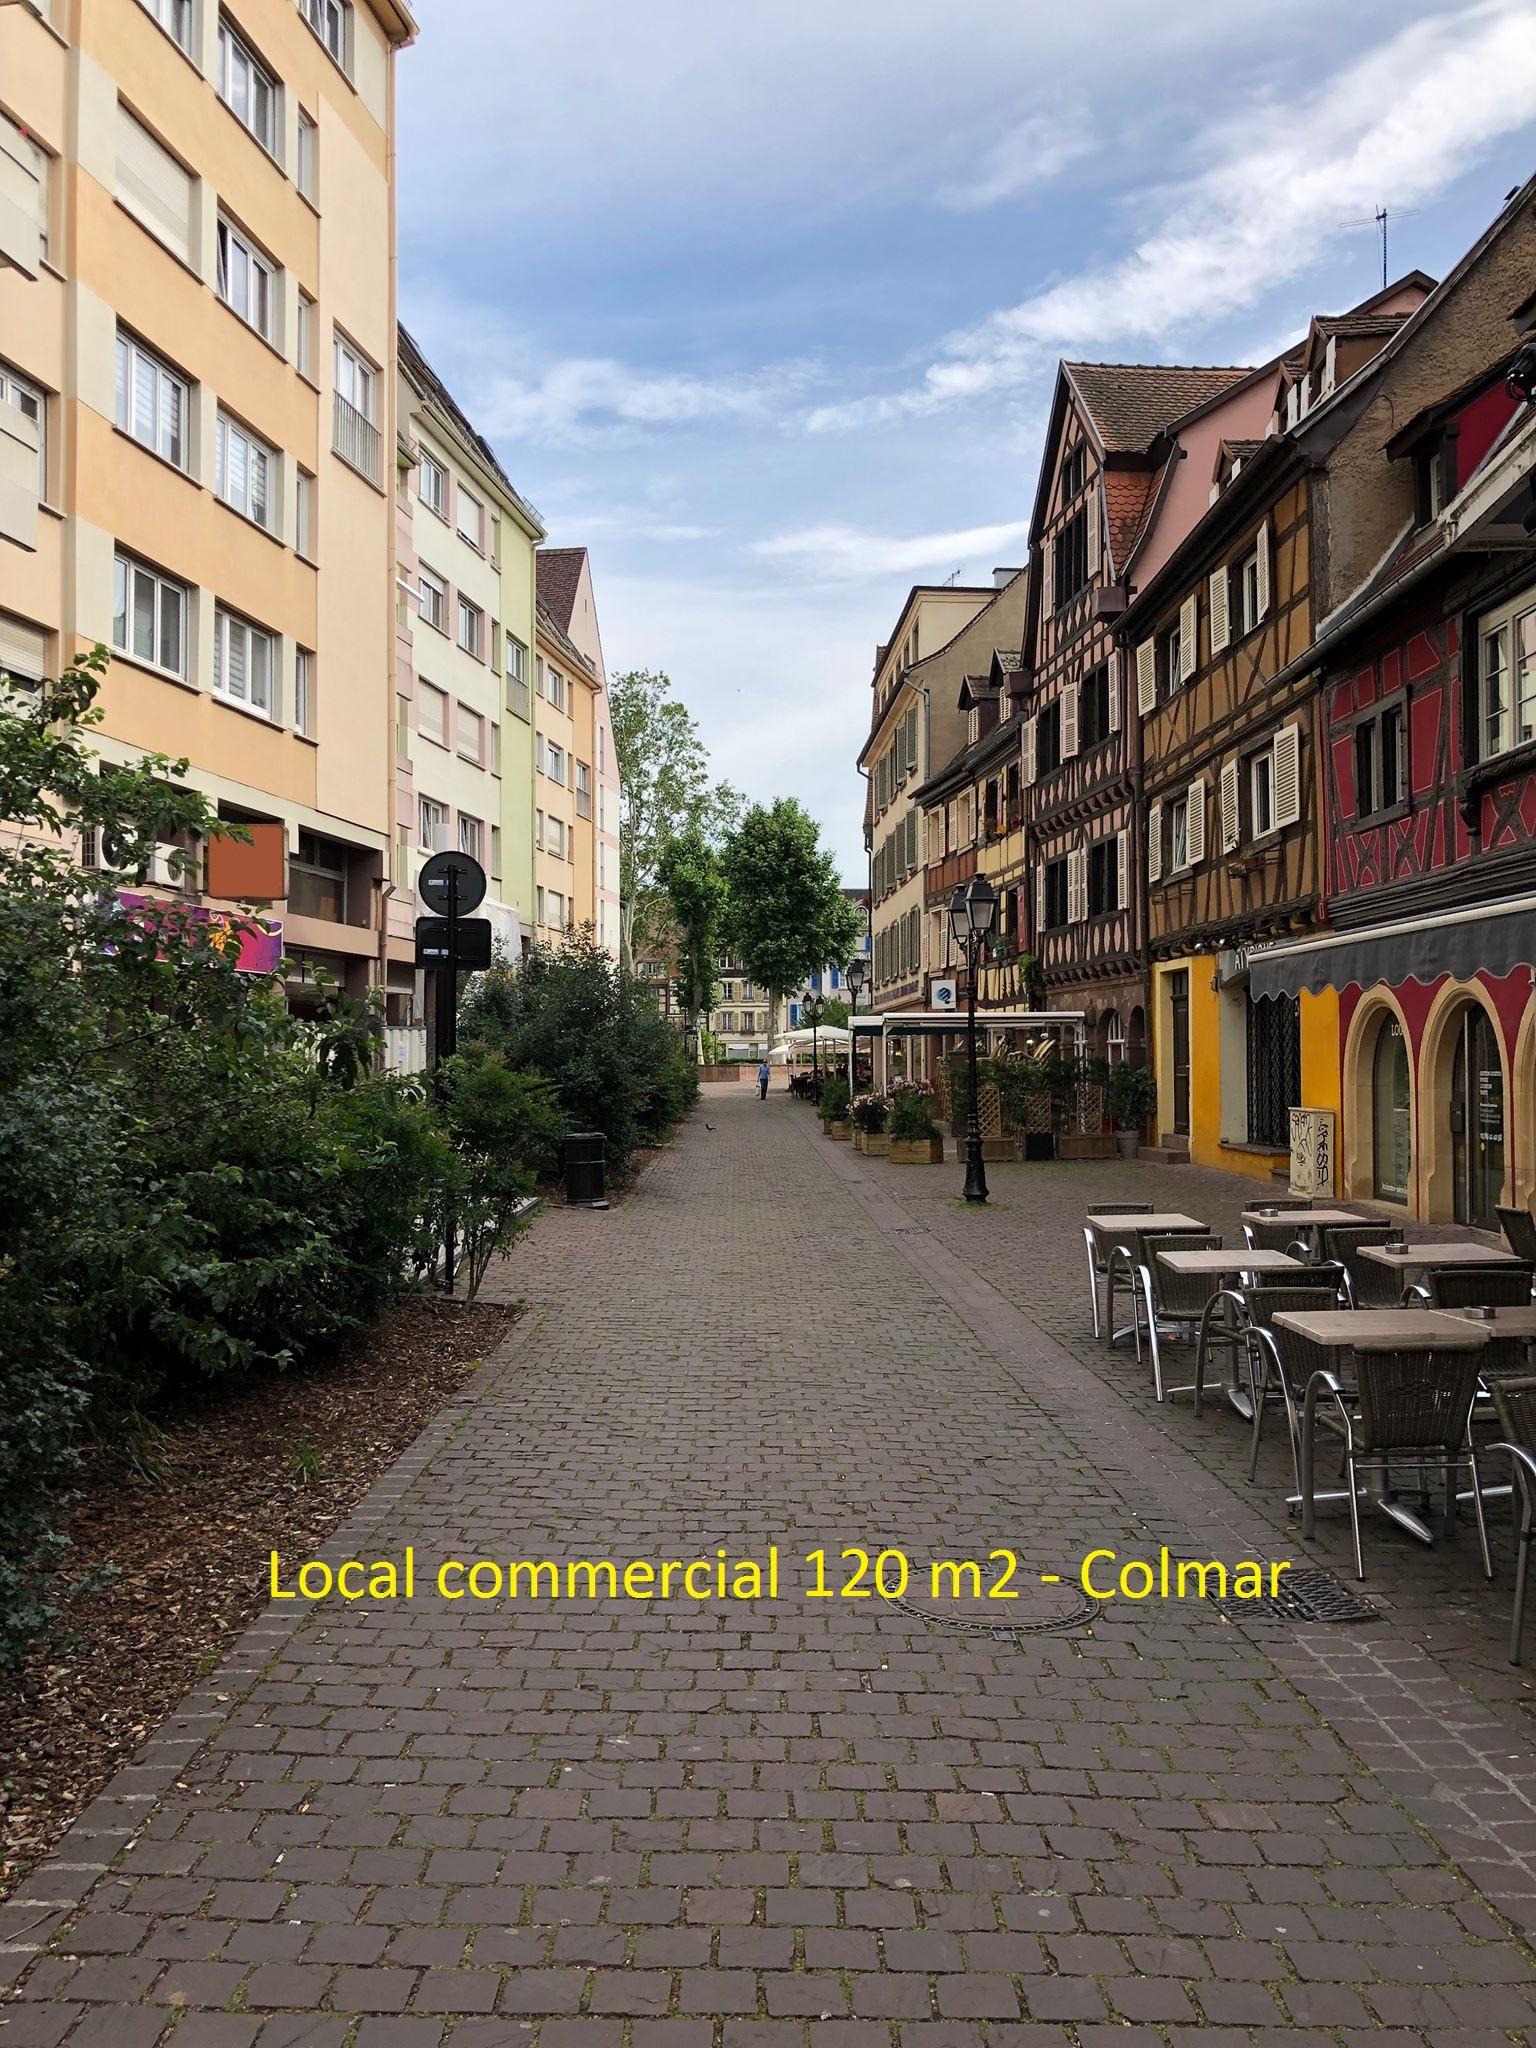 LOCAL COMMERCIAL – COLMAR